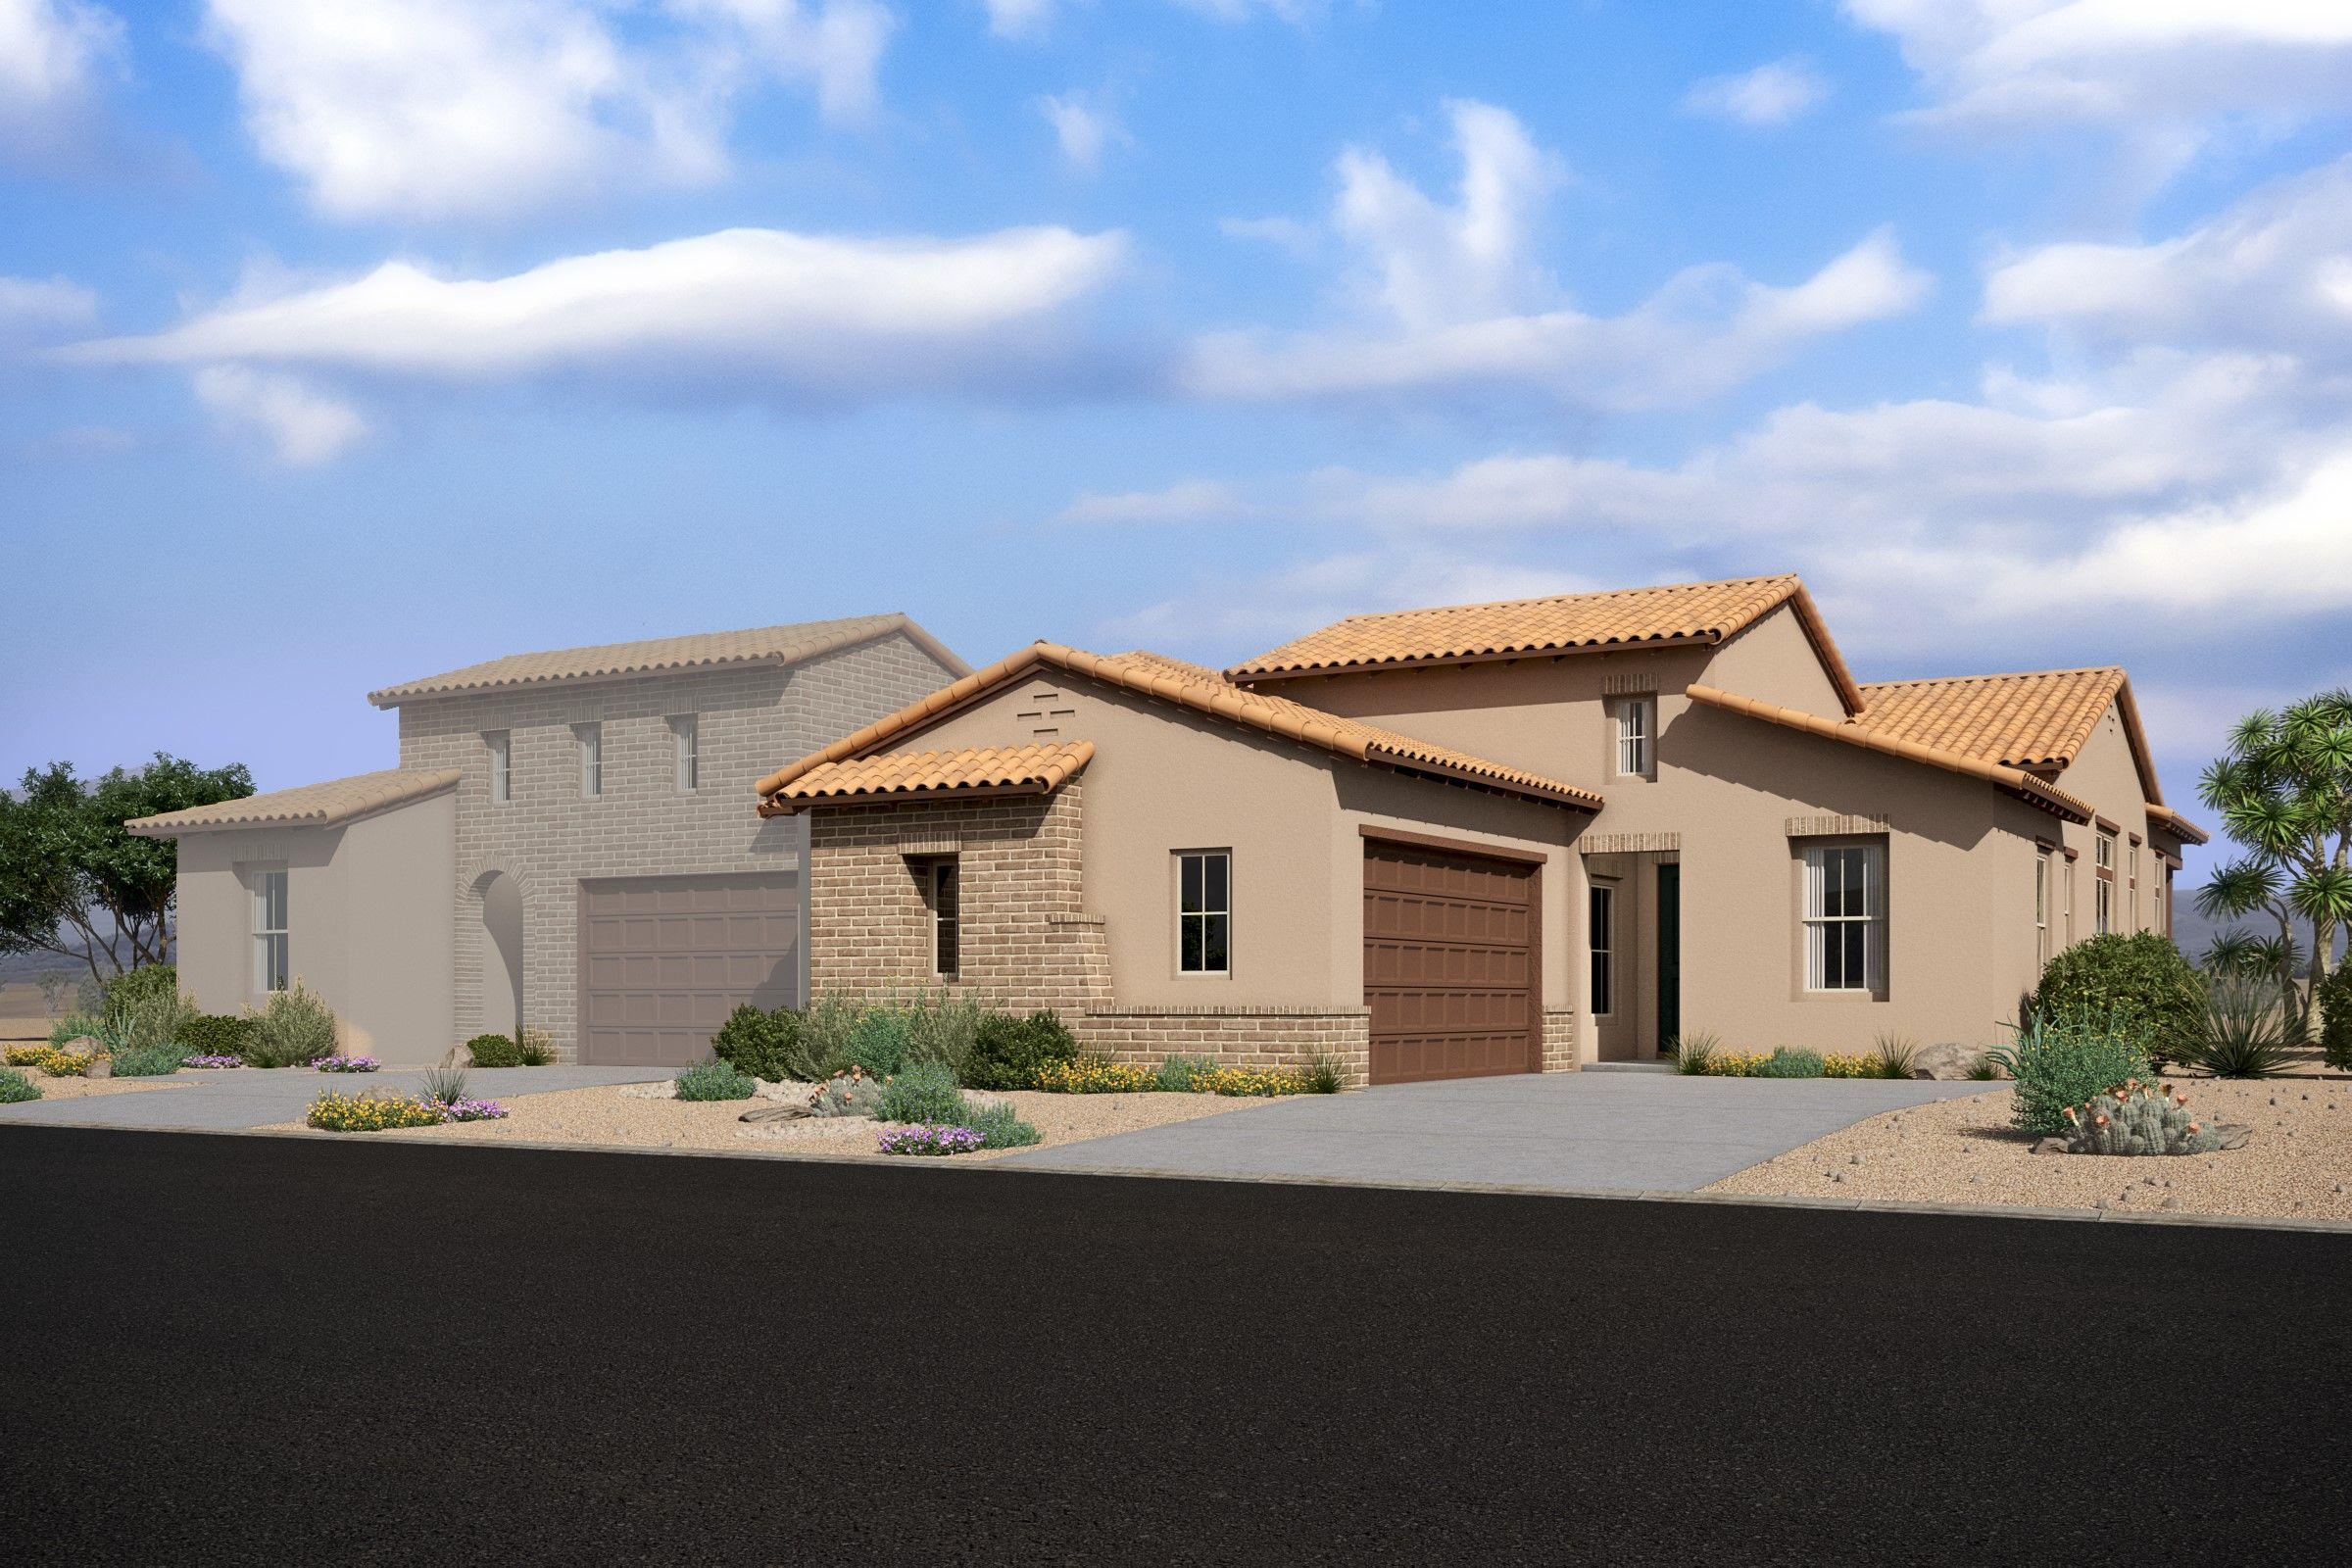 Multi Family for Sale at Summit At Pinnacle Peak Patio - Ascent 10424 East Jomax Road Scottsdale, Arizona 85262 United States